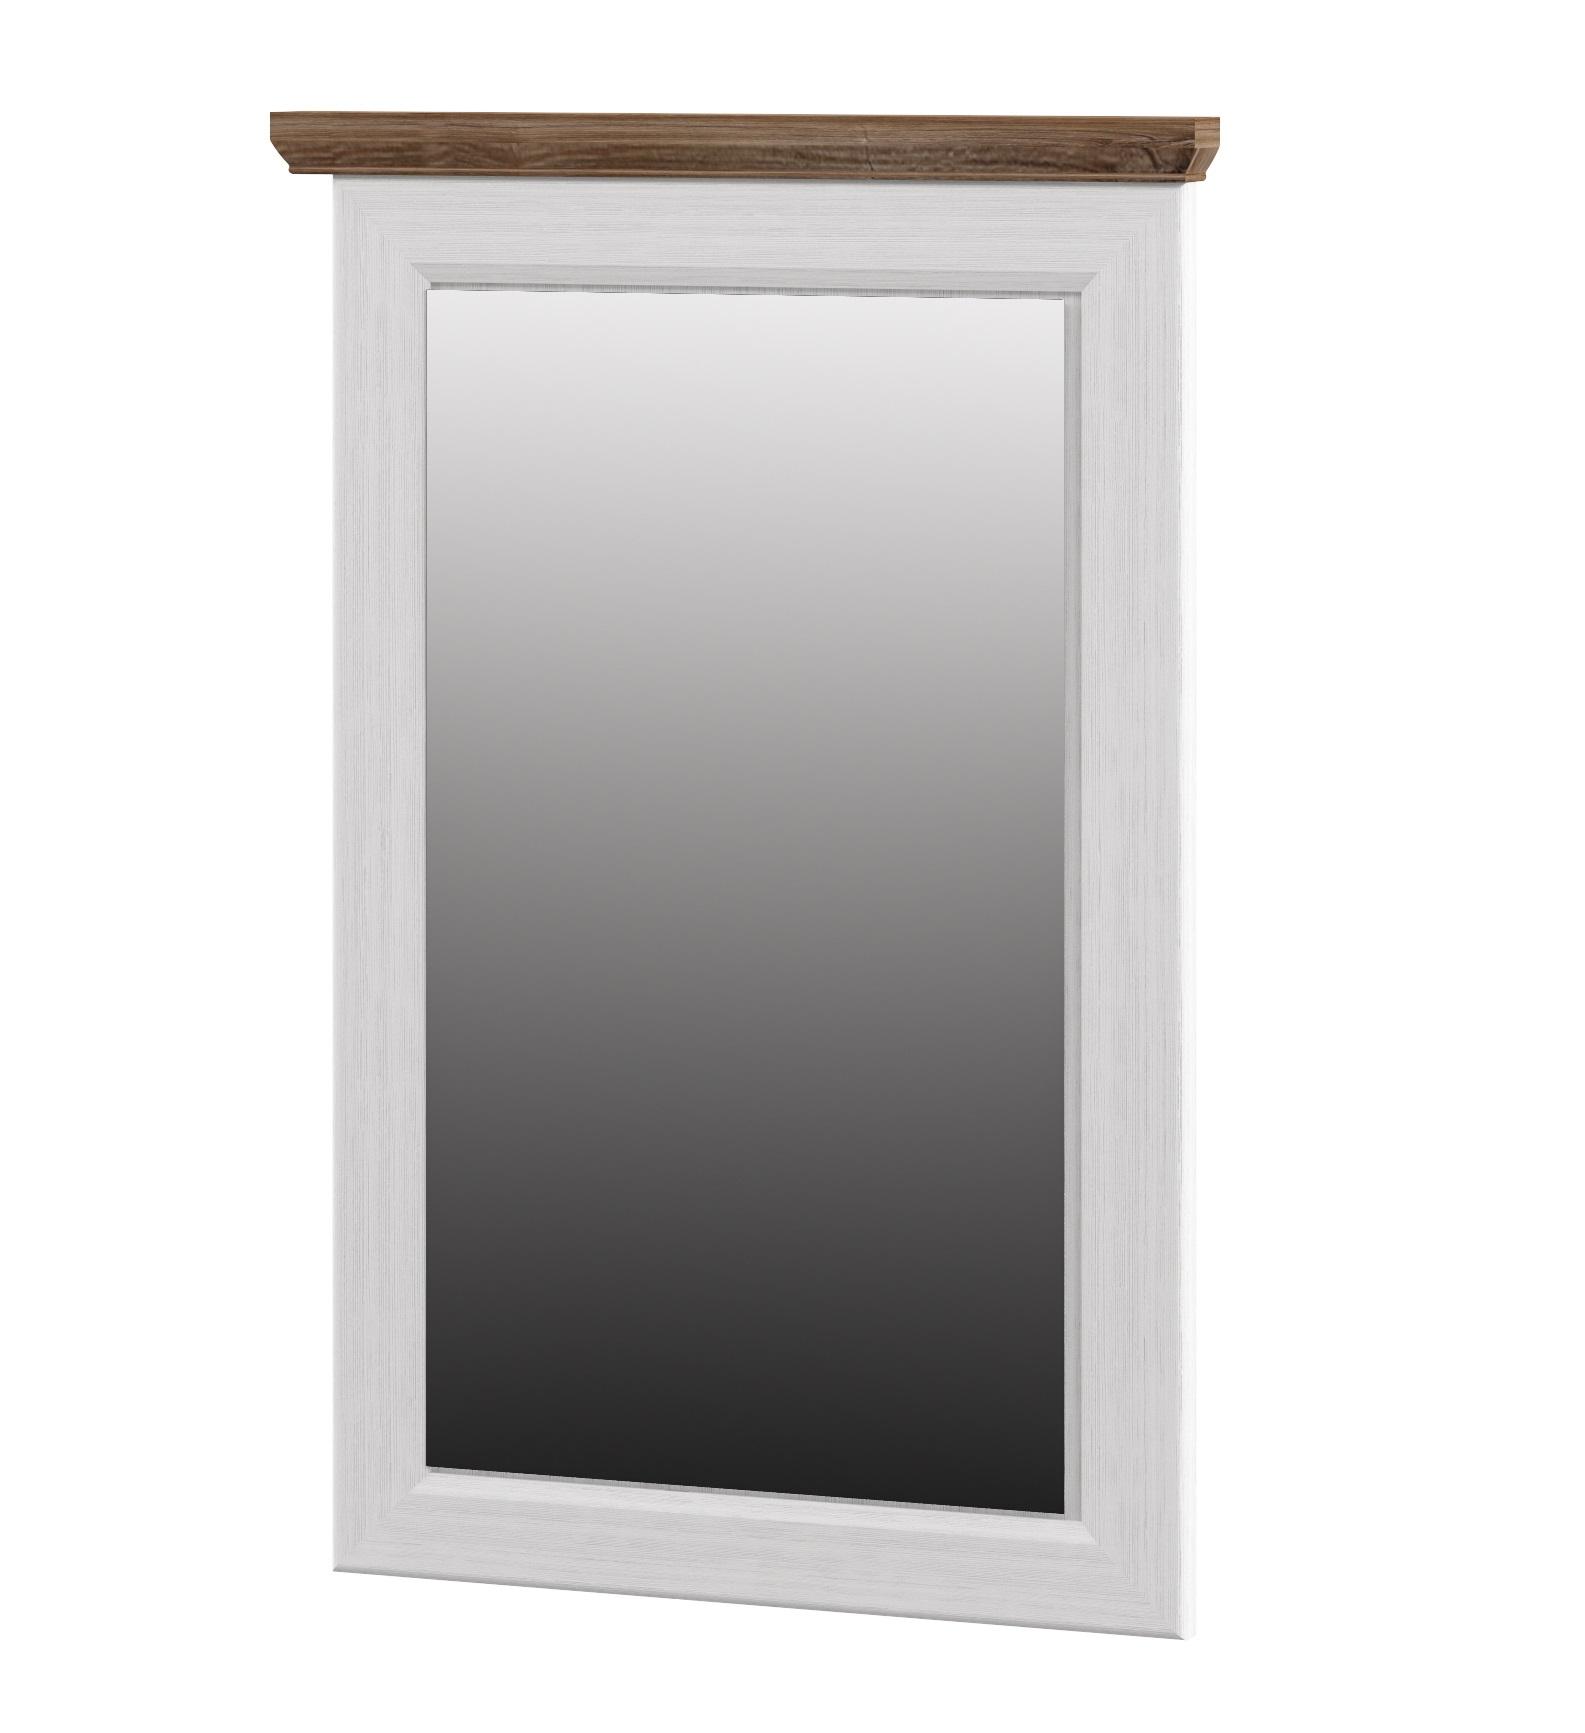 Neman Wandspiegel Tivoli 64x96 cm Landhausstil Weiß